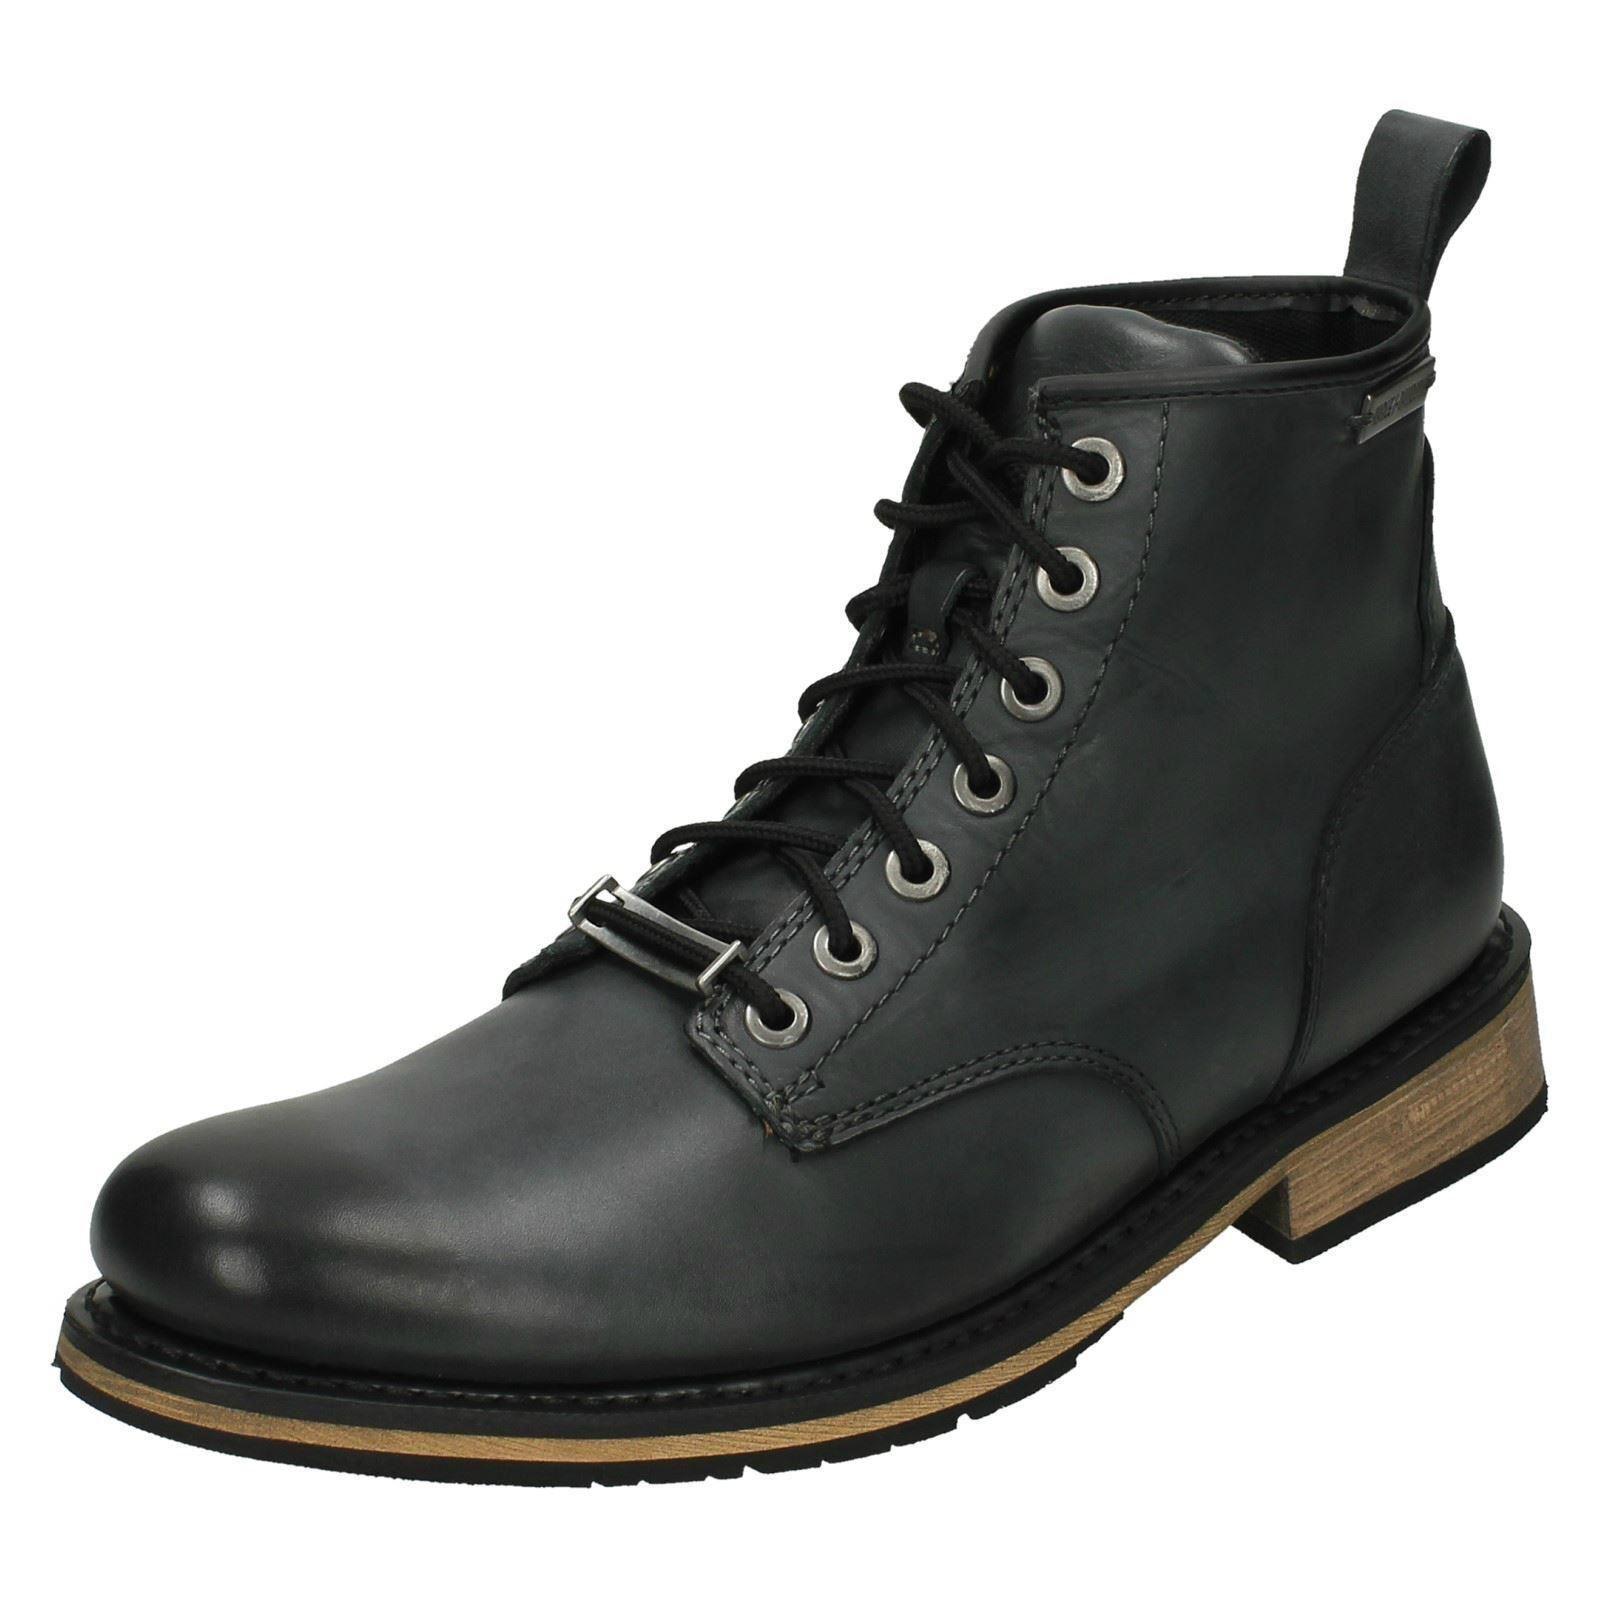 Men's Harley Davidson Ankle Boots - Joshua